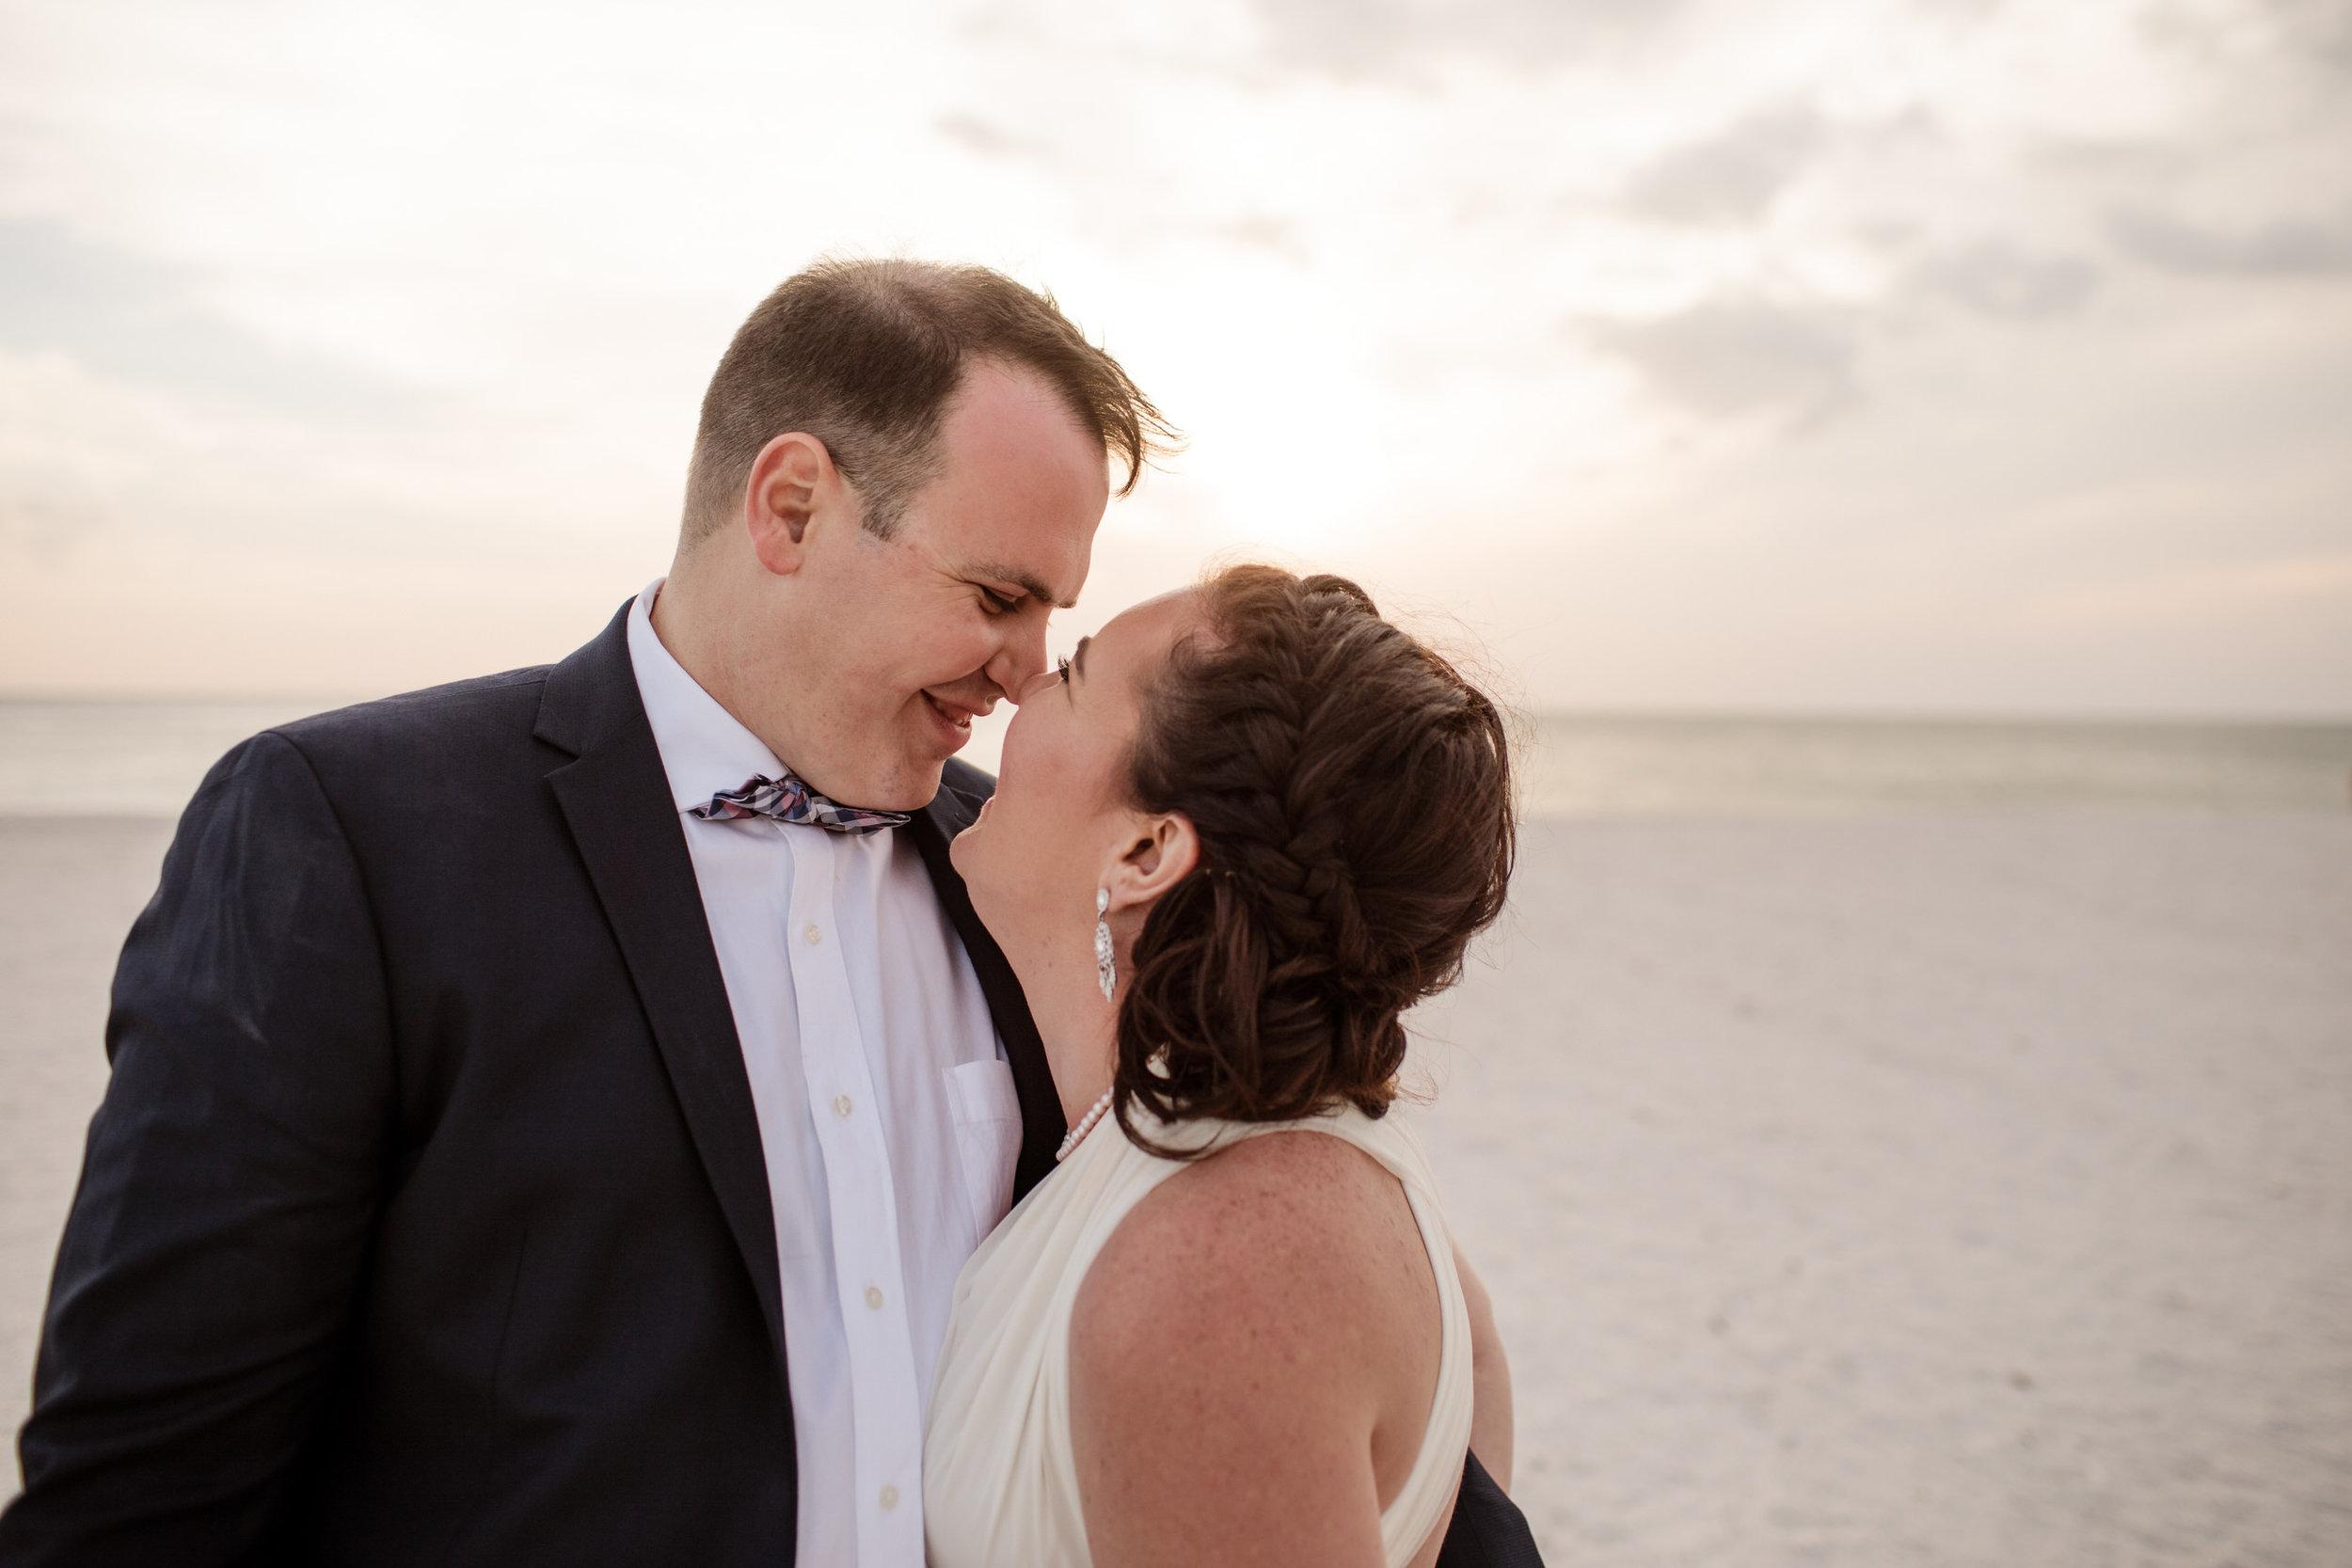 Beltran_Treasure_Island_Elopement_Tampa_Wedding_142-1.jpg